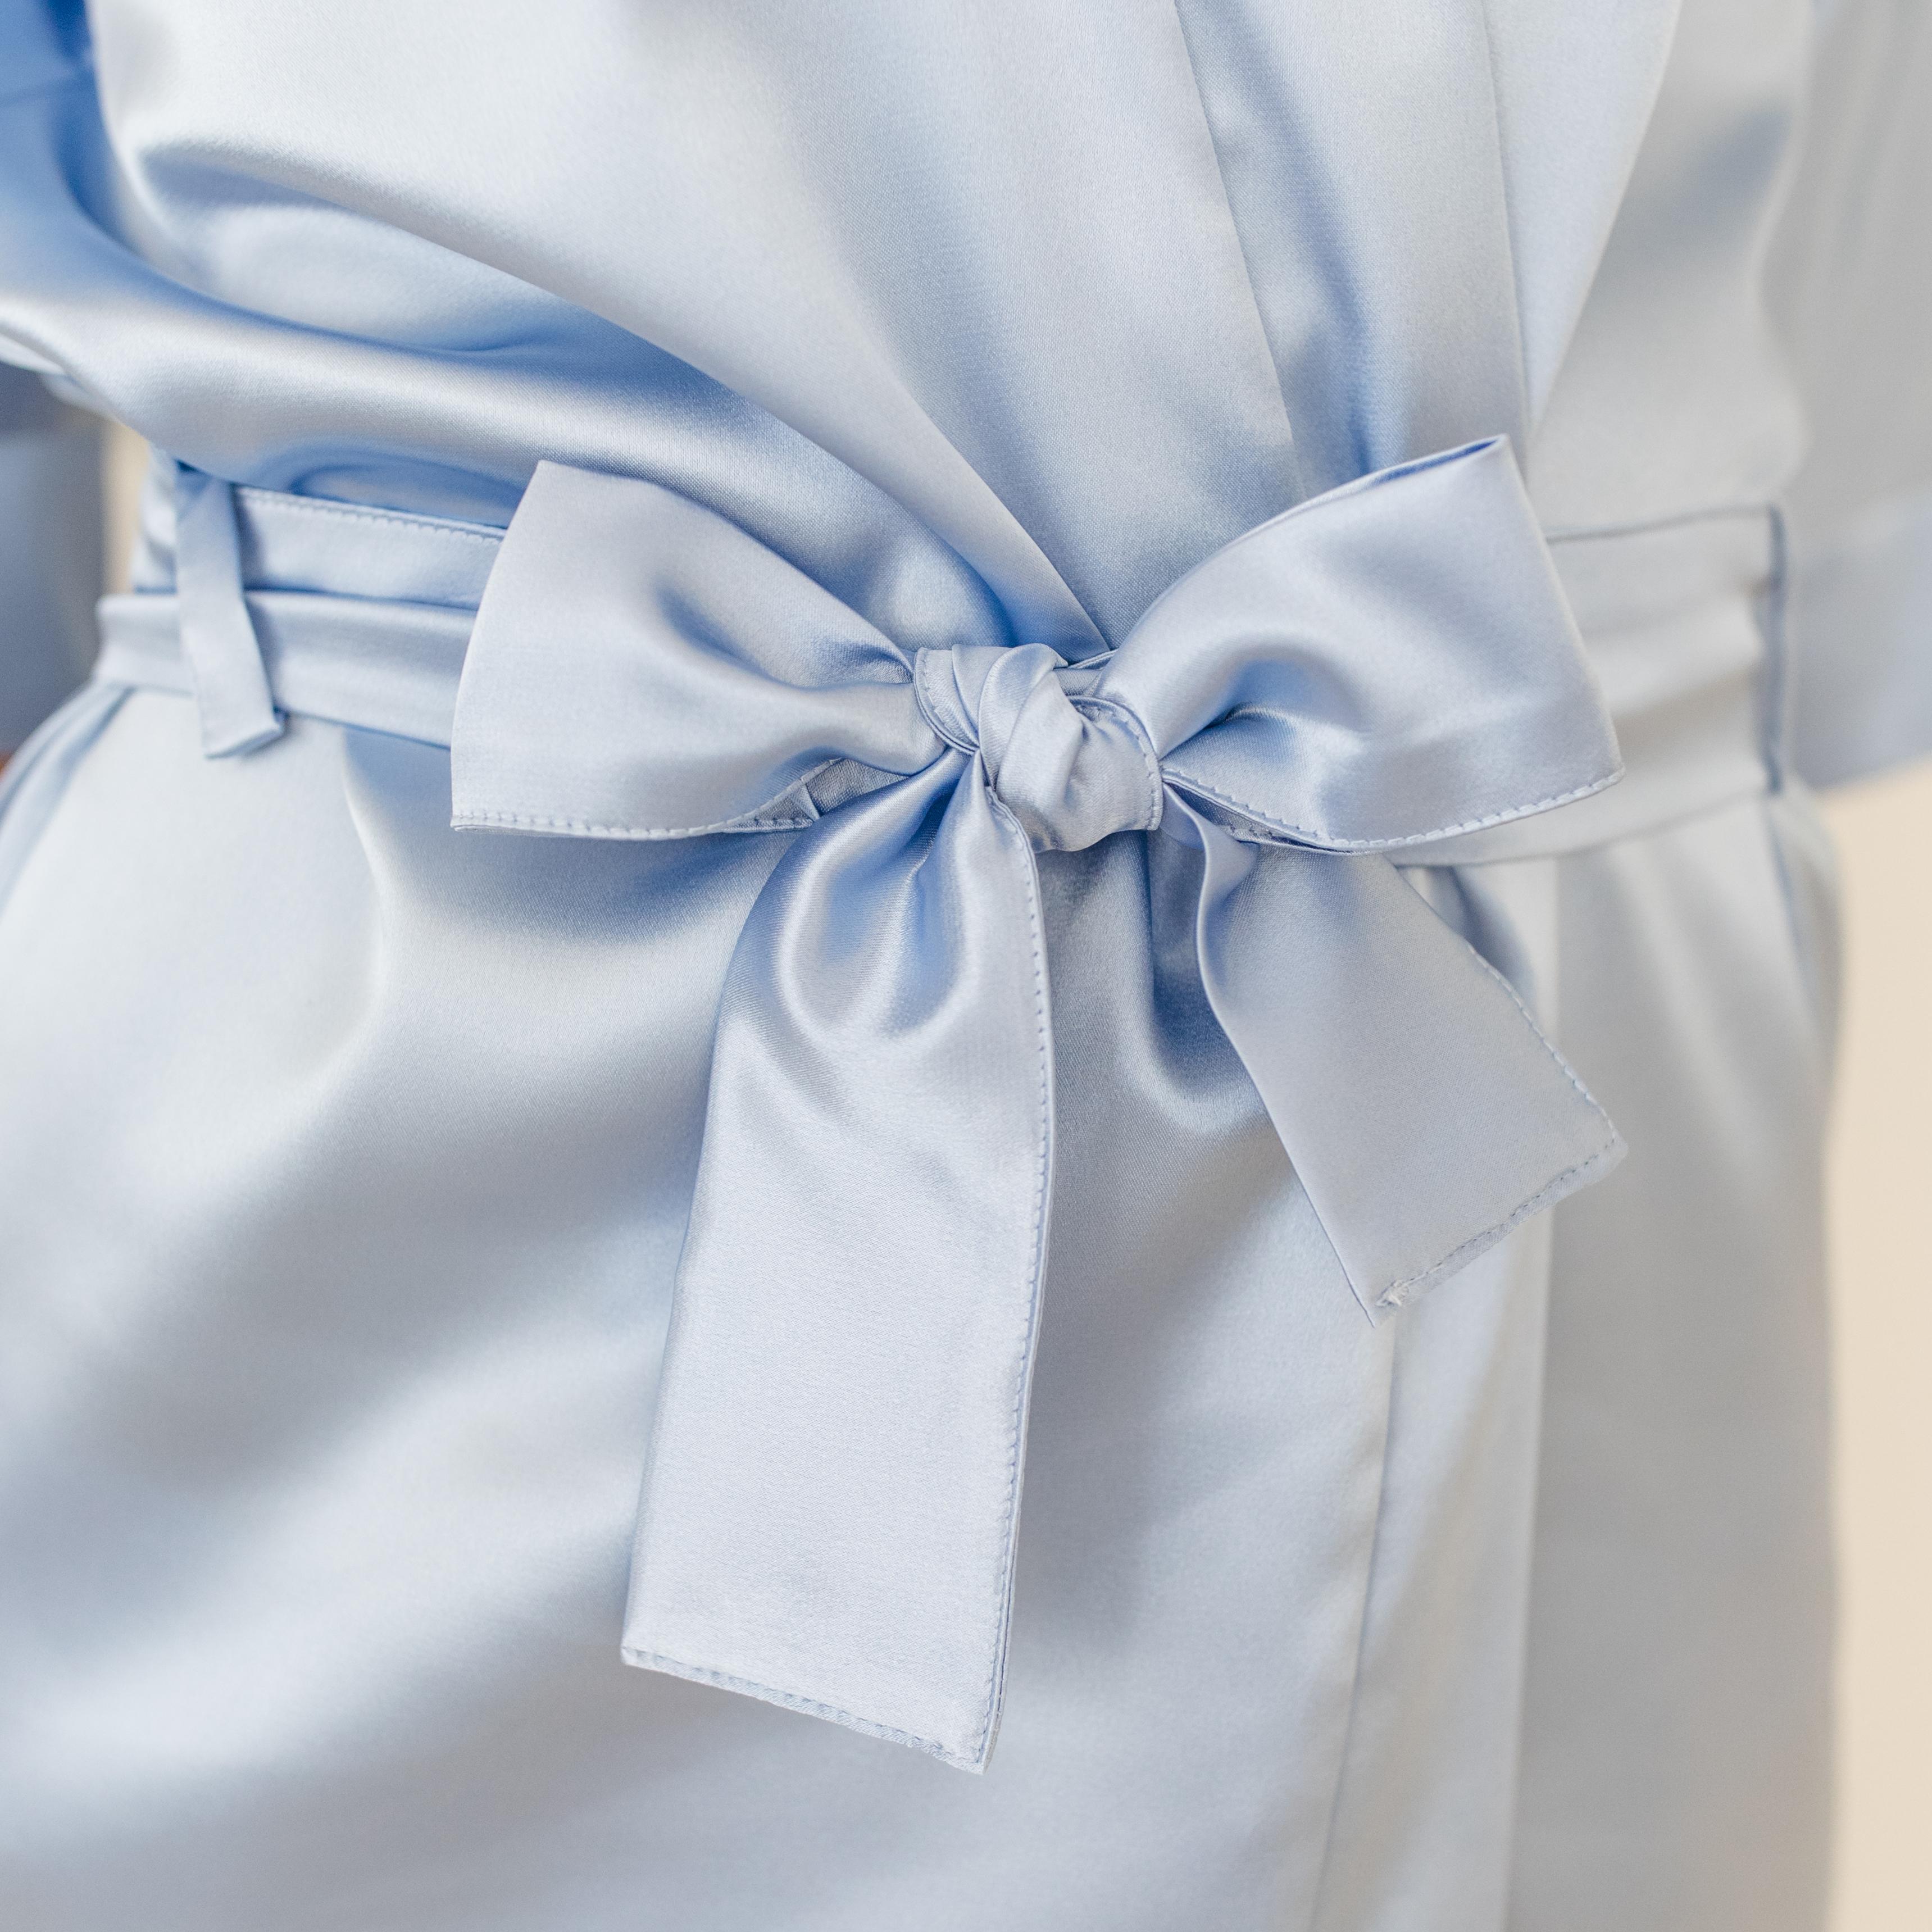 Kimono Morgenmantel Brautjungfern blau